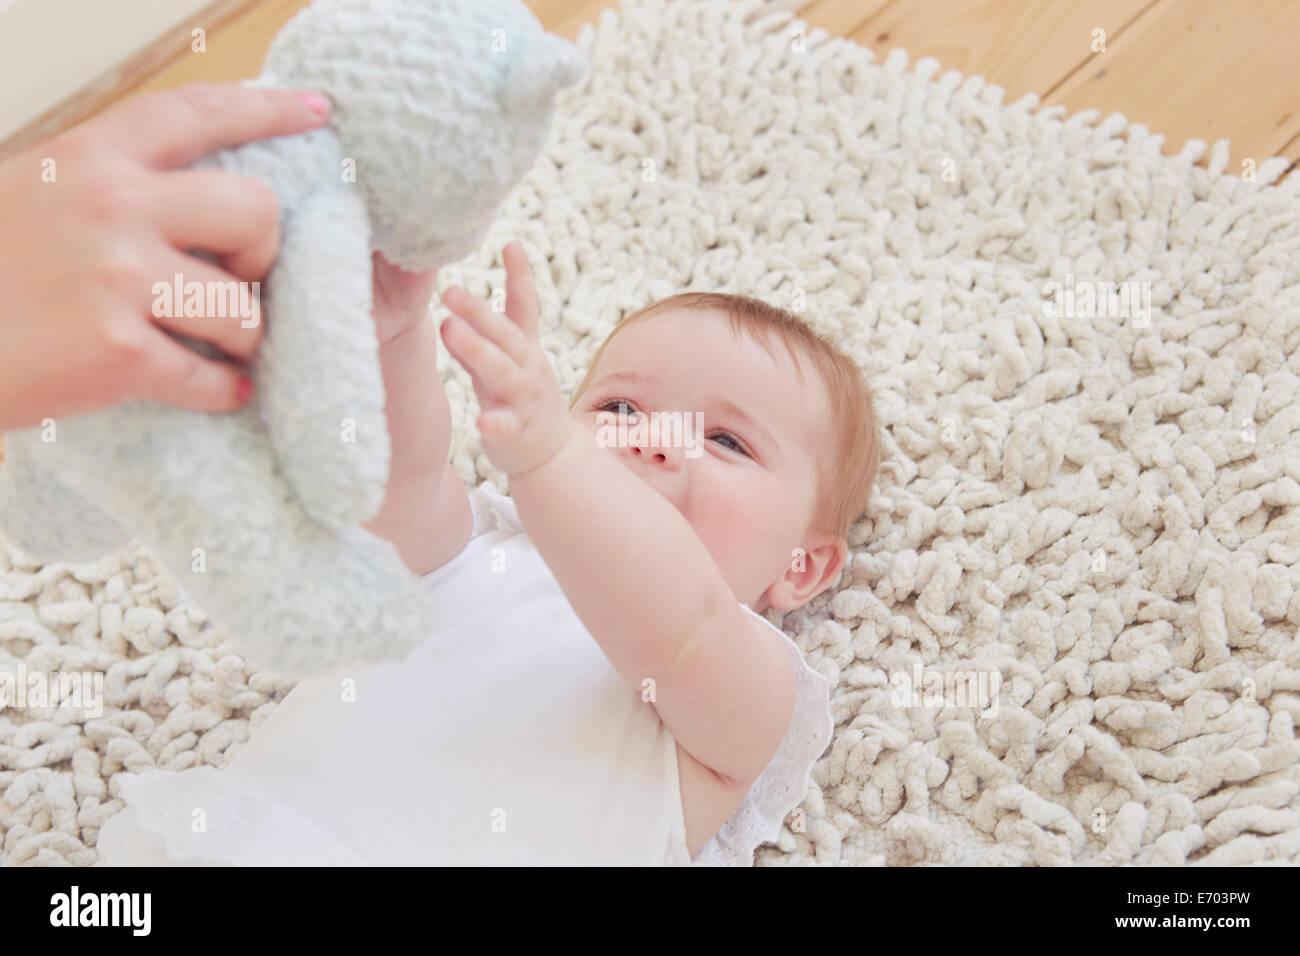 Female hand holding up teddy bear for baby girl lying on rug - Stock Image